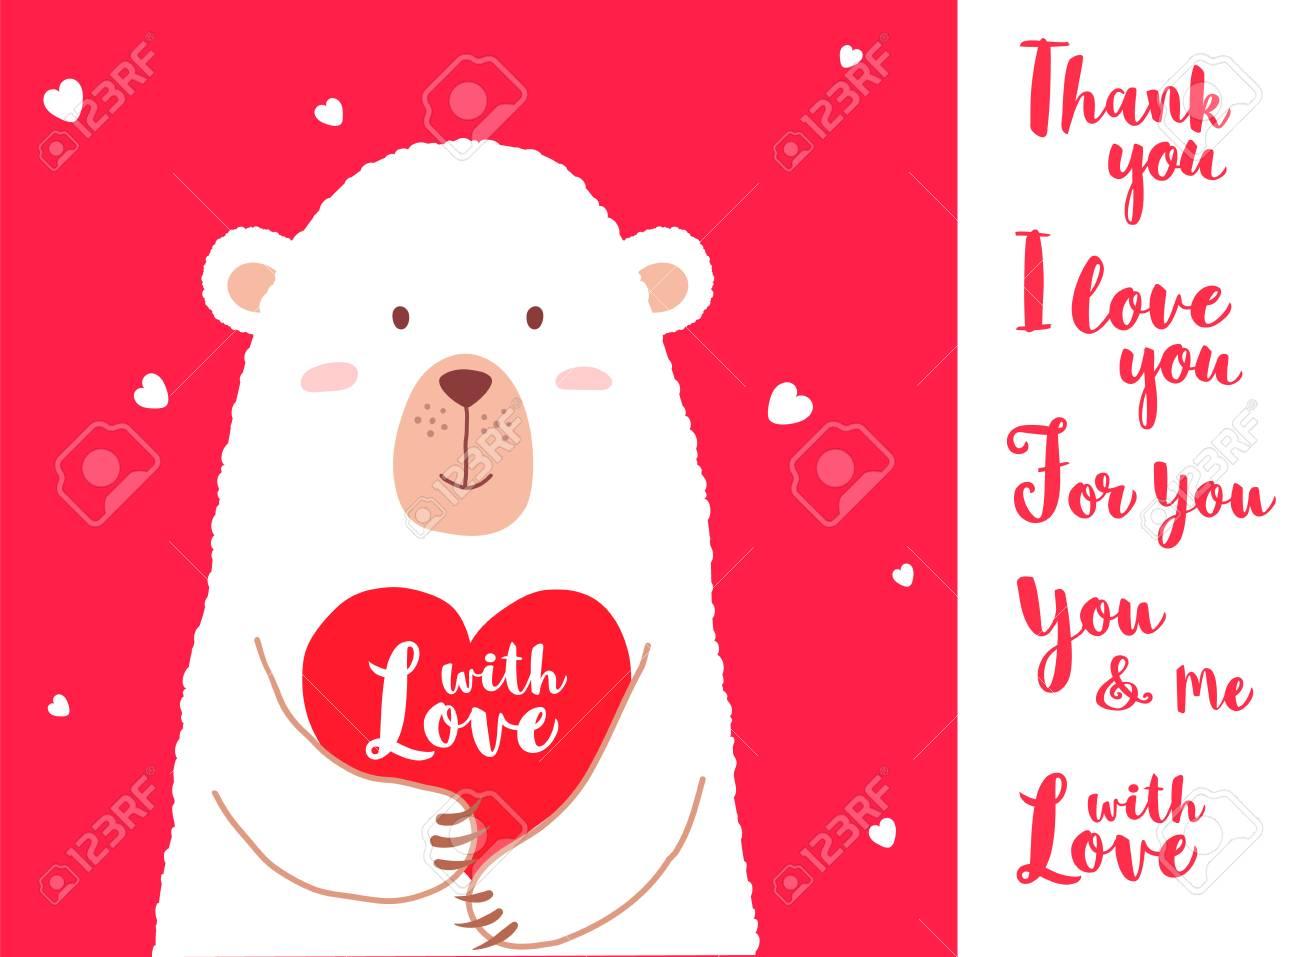 vector illustration of cute cartoon bear holding heart and hand